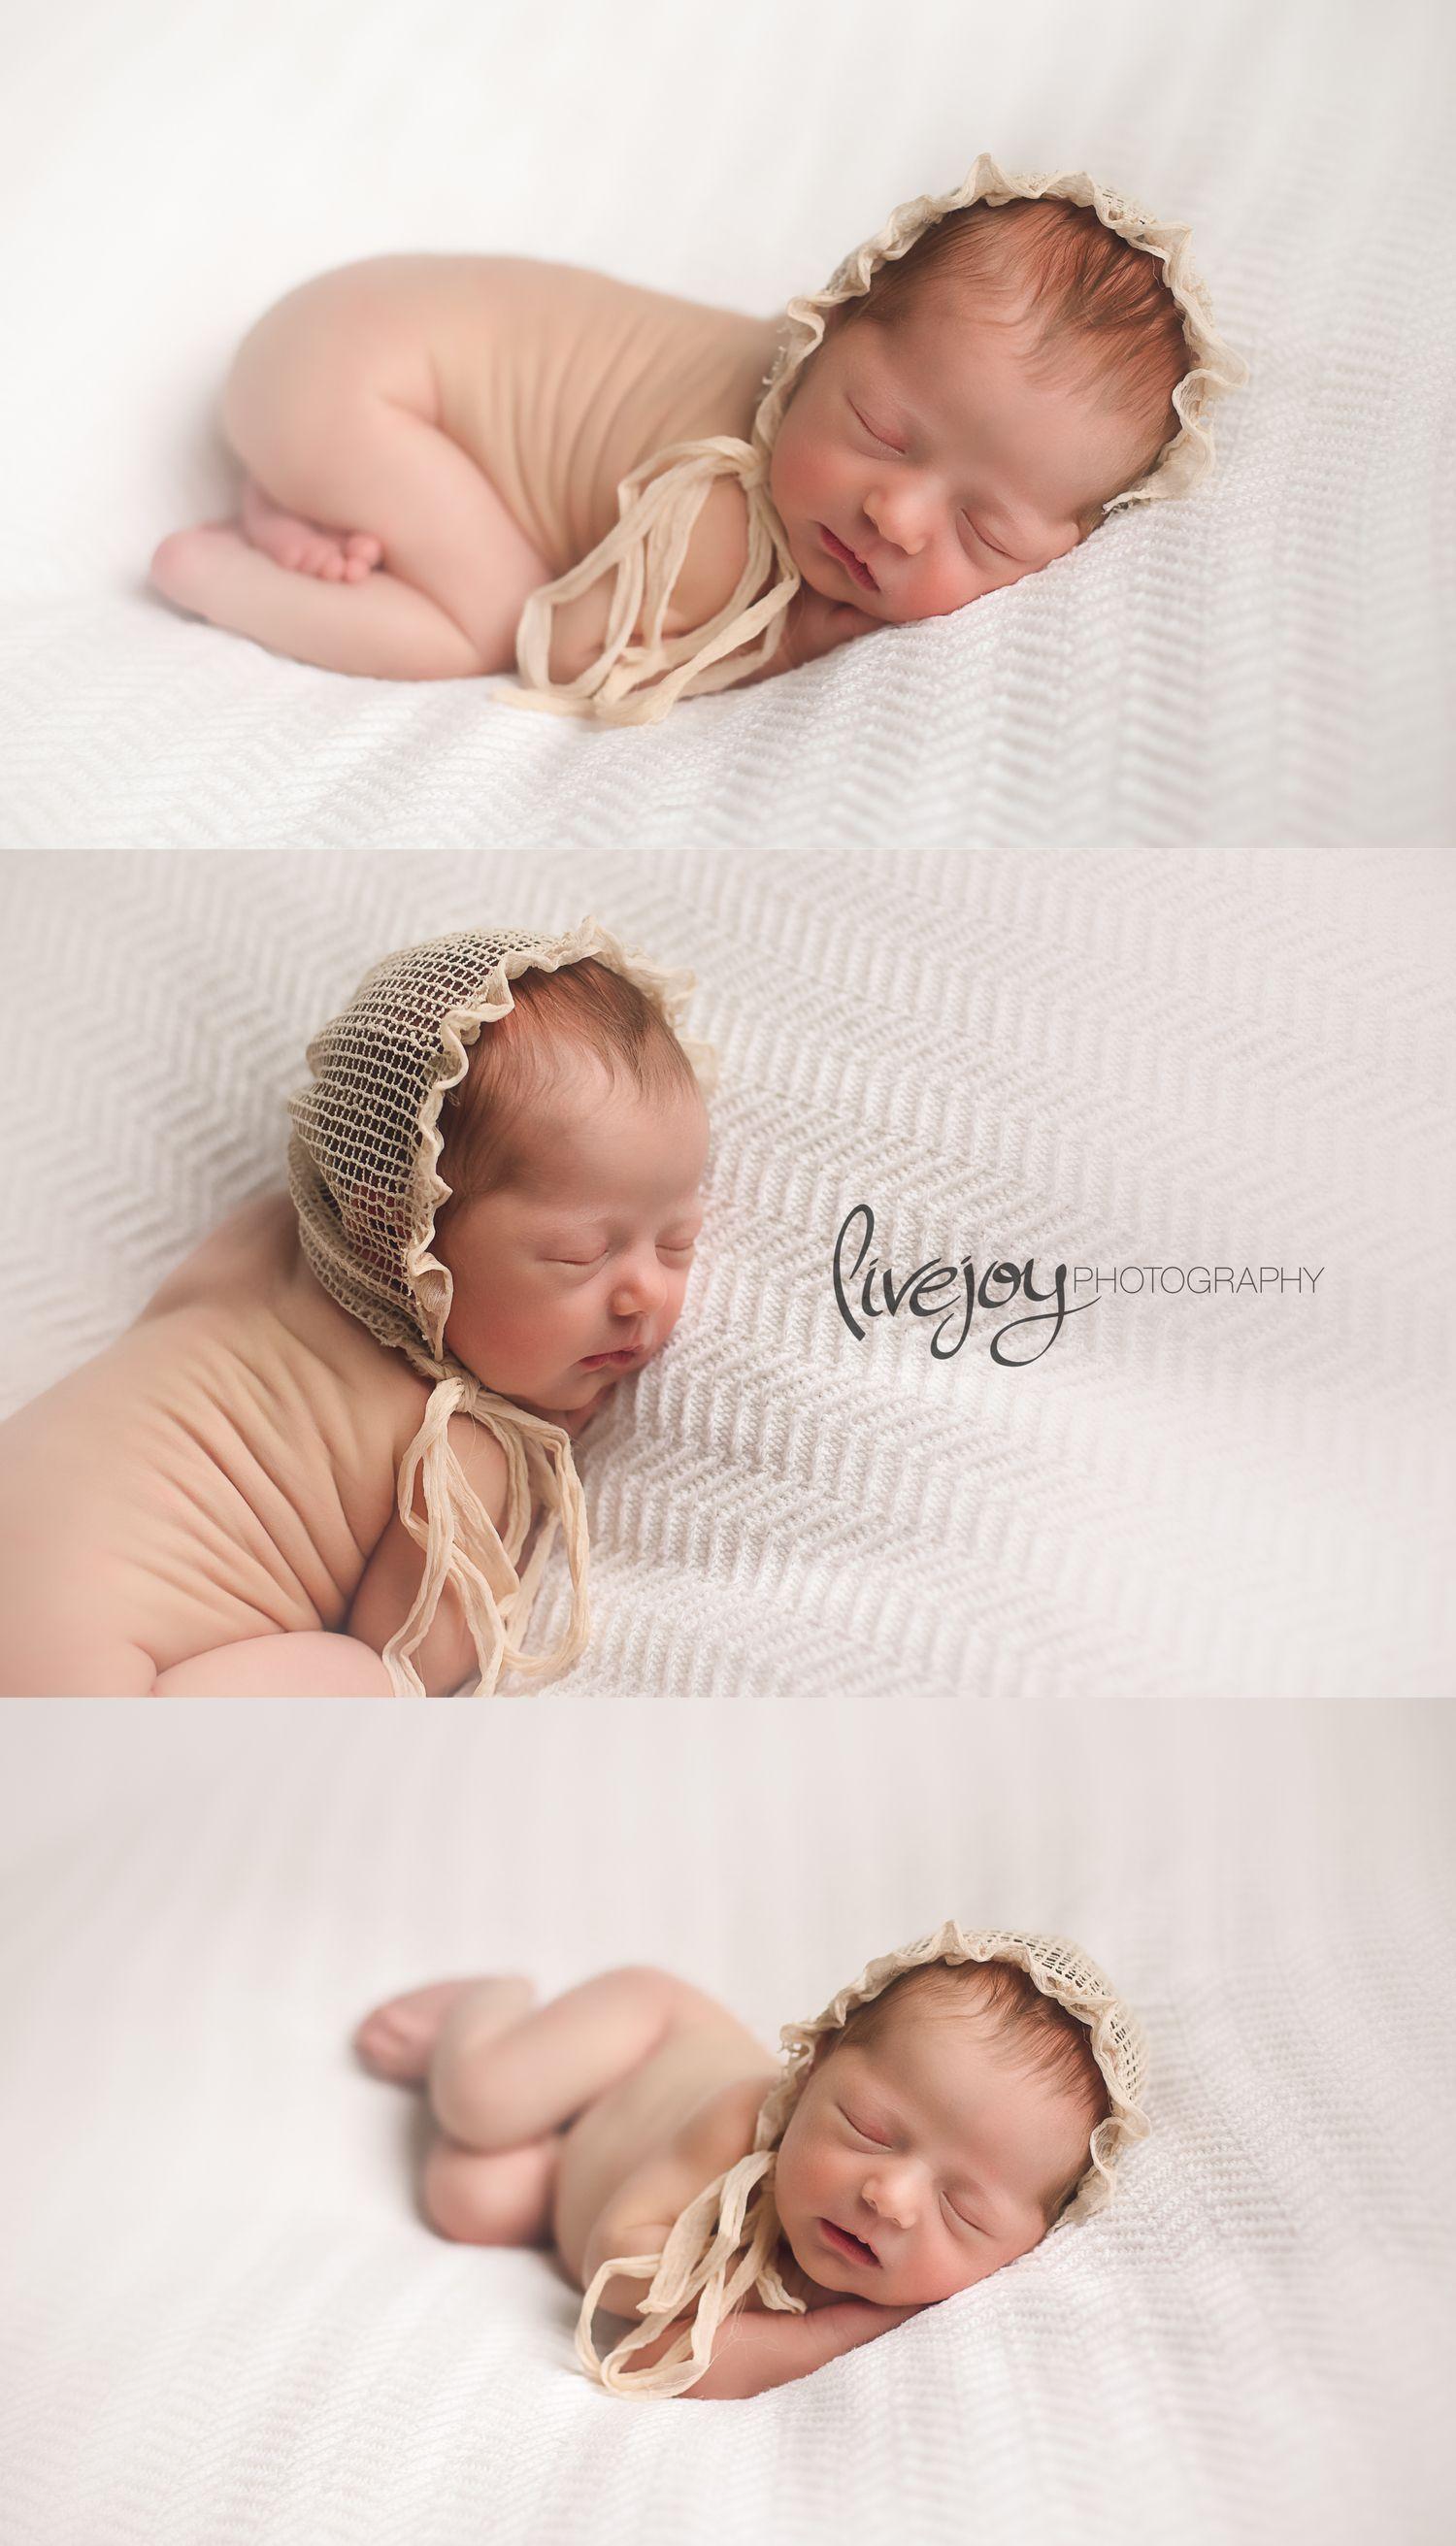 Newborn girl photography livejoy photography oregon